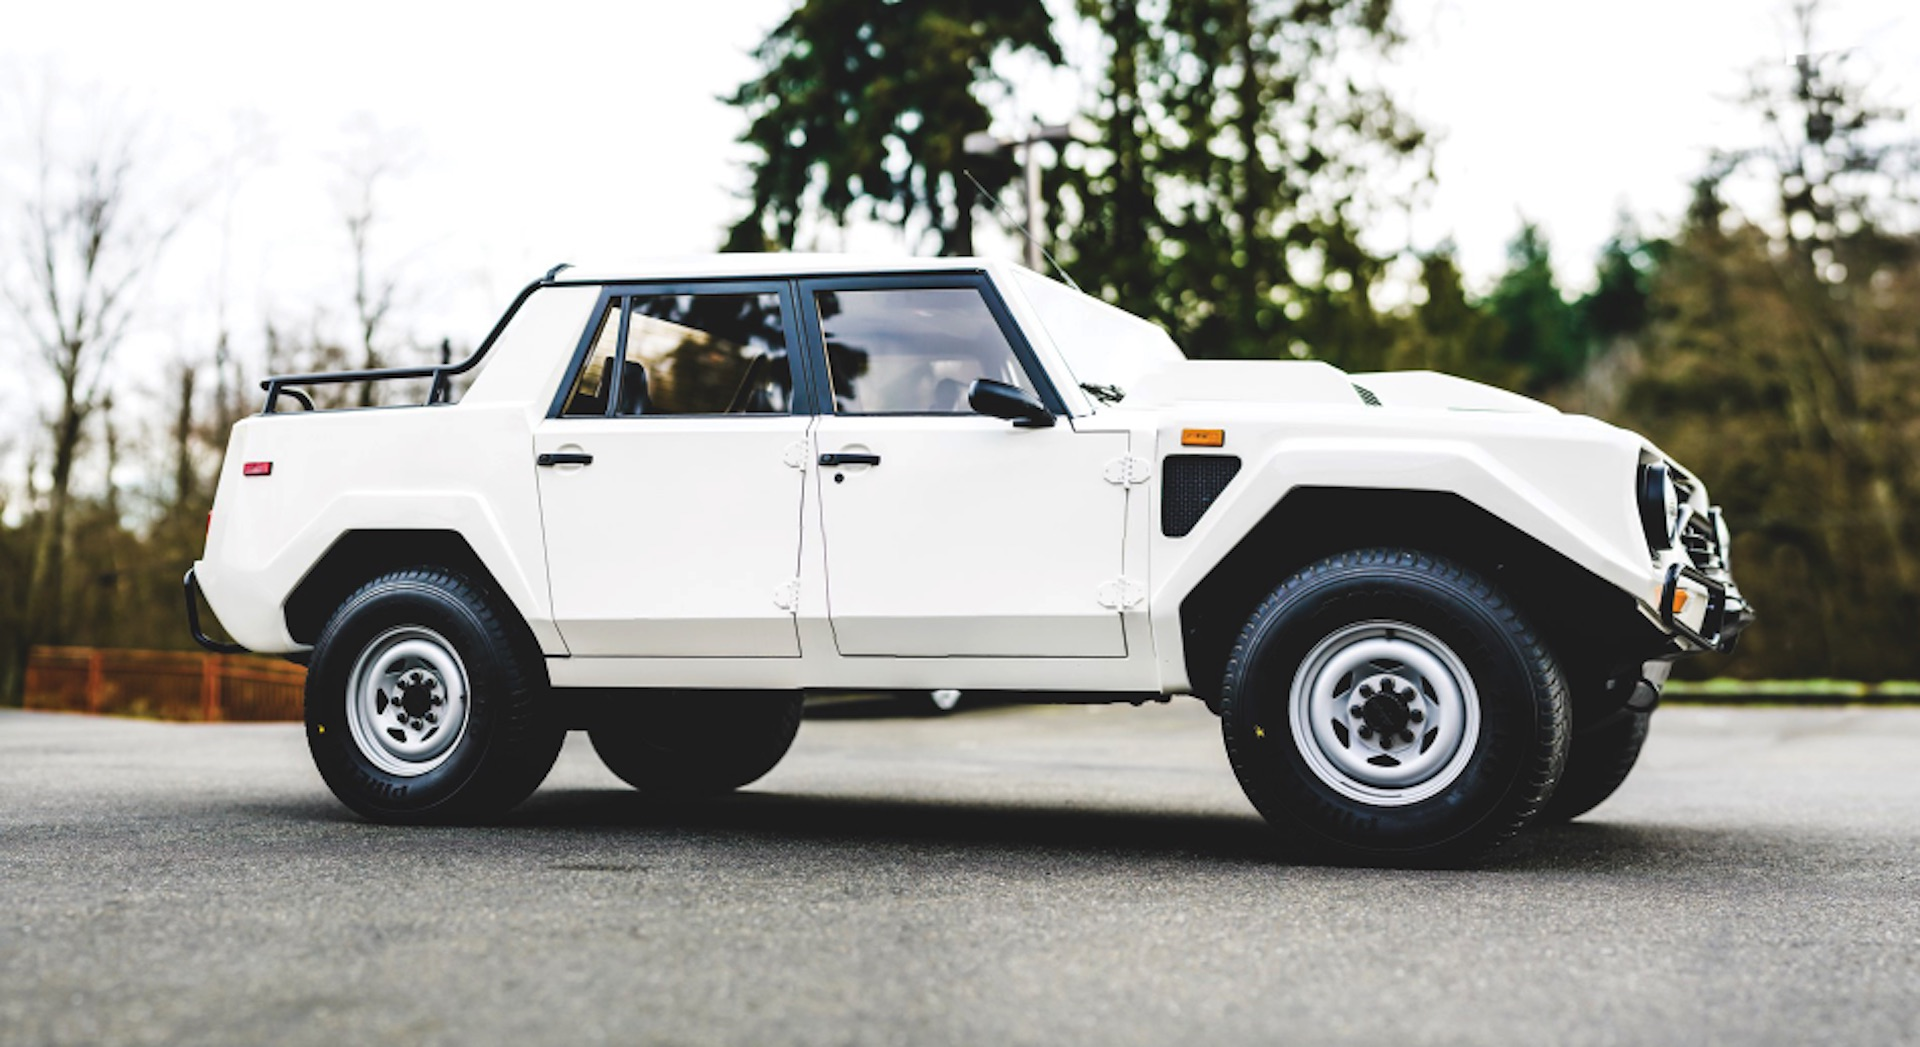 Buy Yourself A Rambo Lambo 1988 Lamborghini Lm002 Heading To Auction